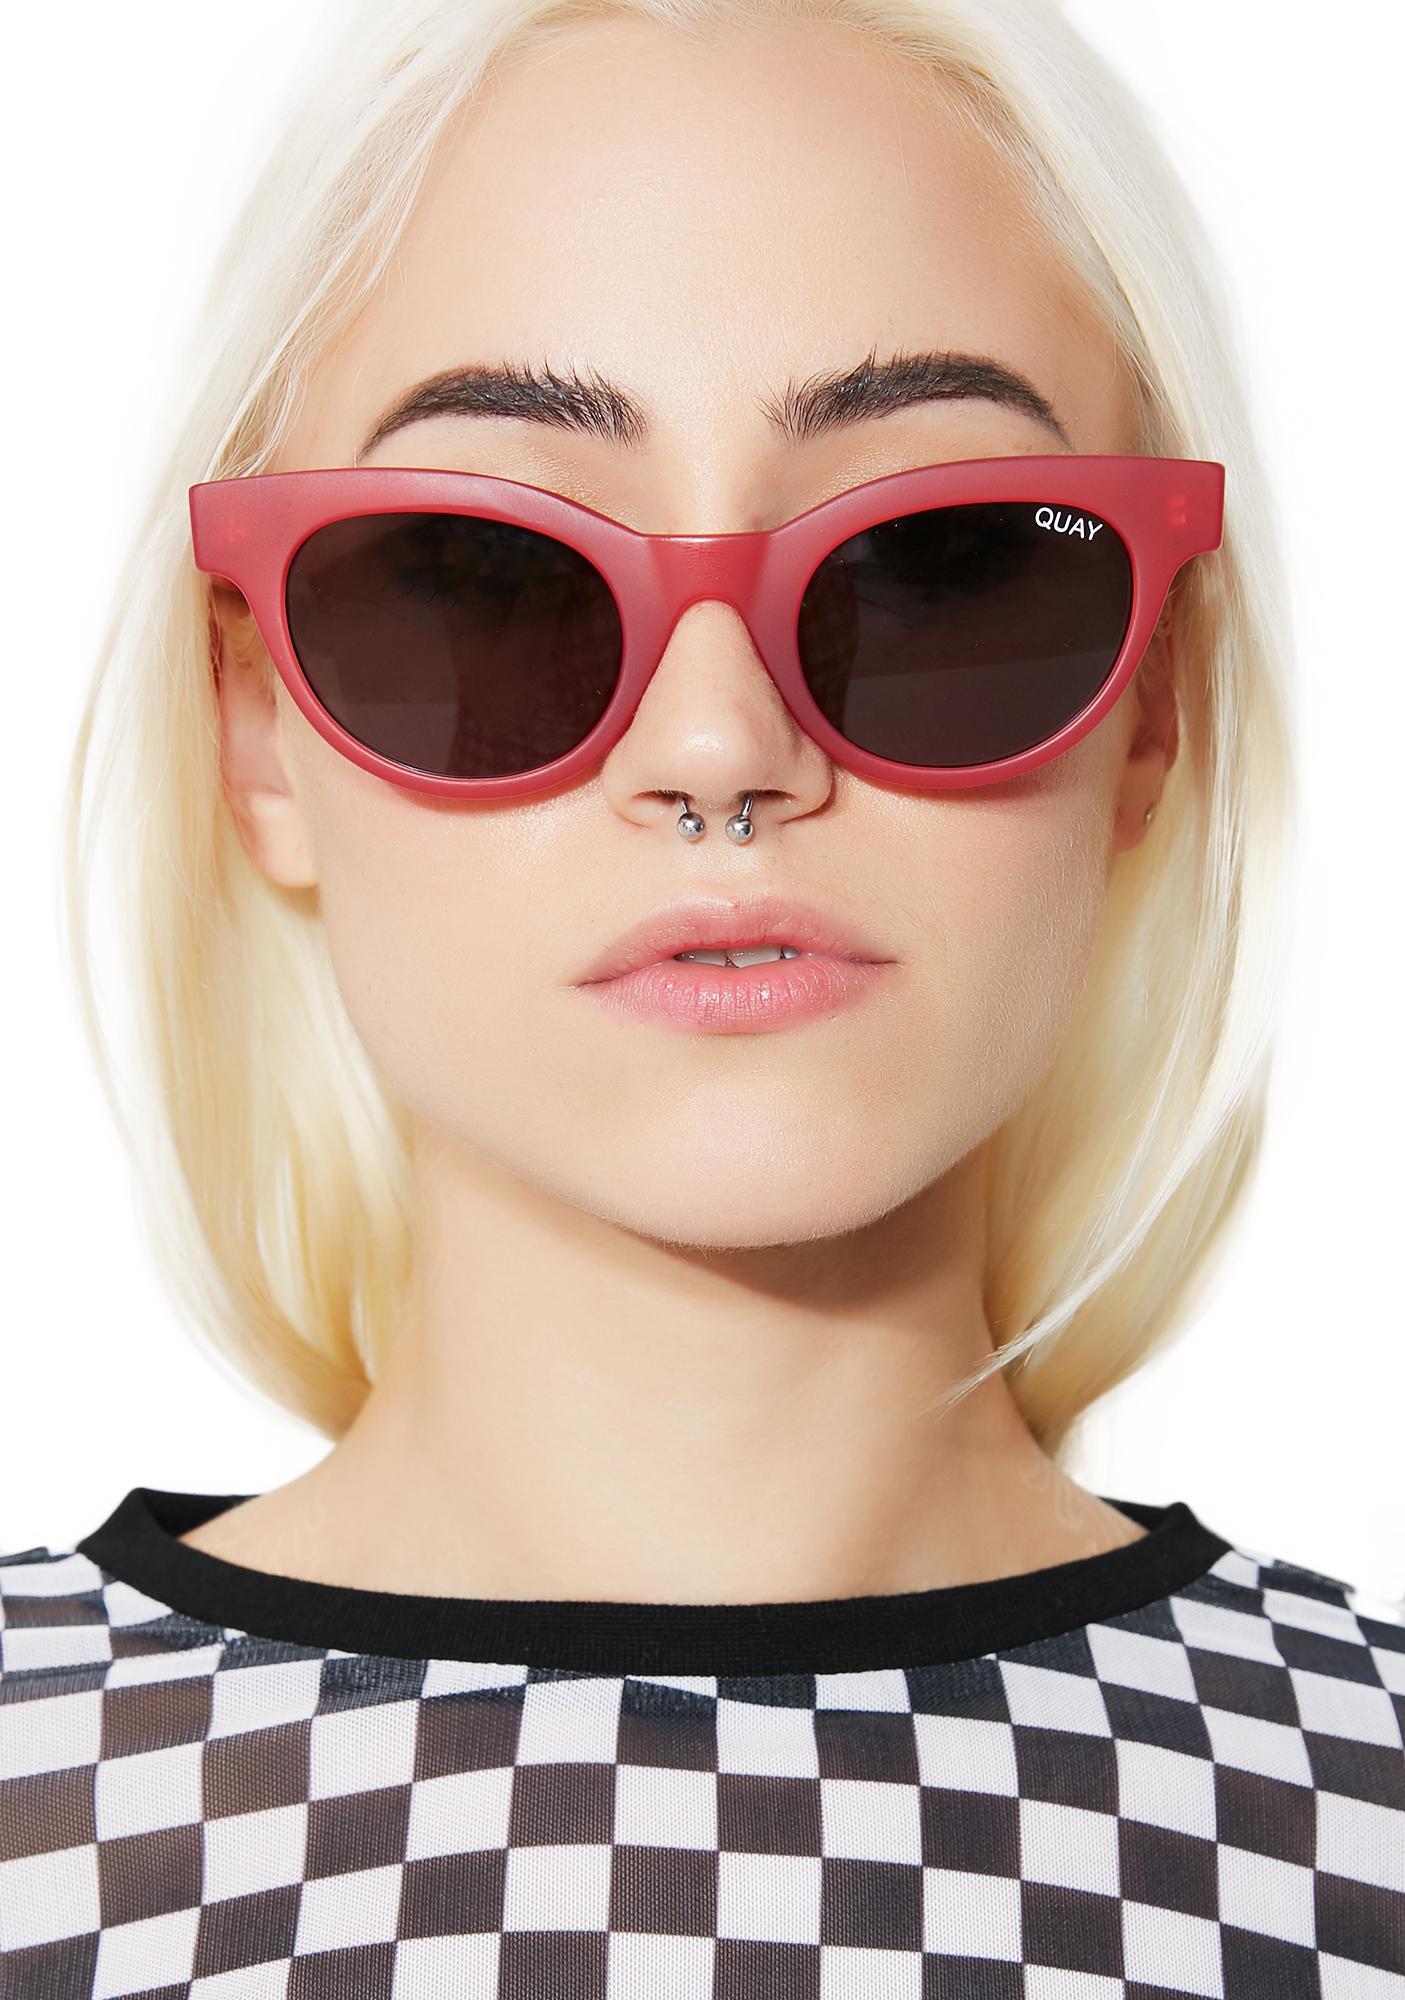 36fc5d9c46 Quay Eyeware x Kylie Starstruck Sunnies